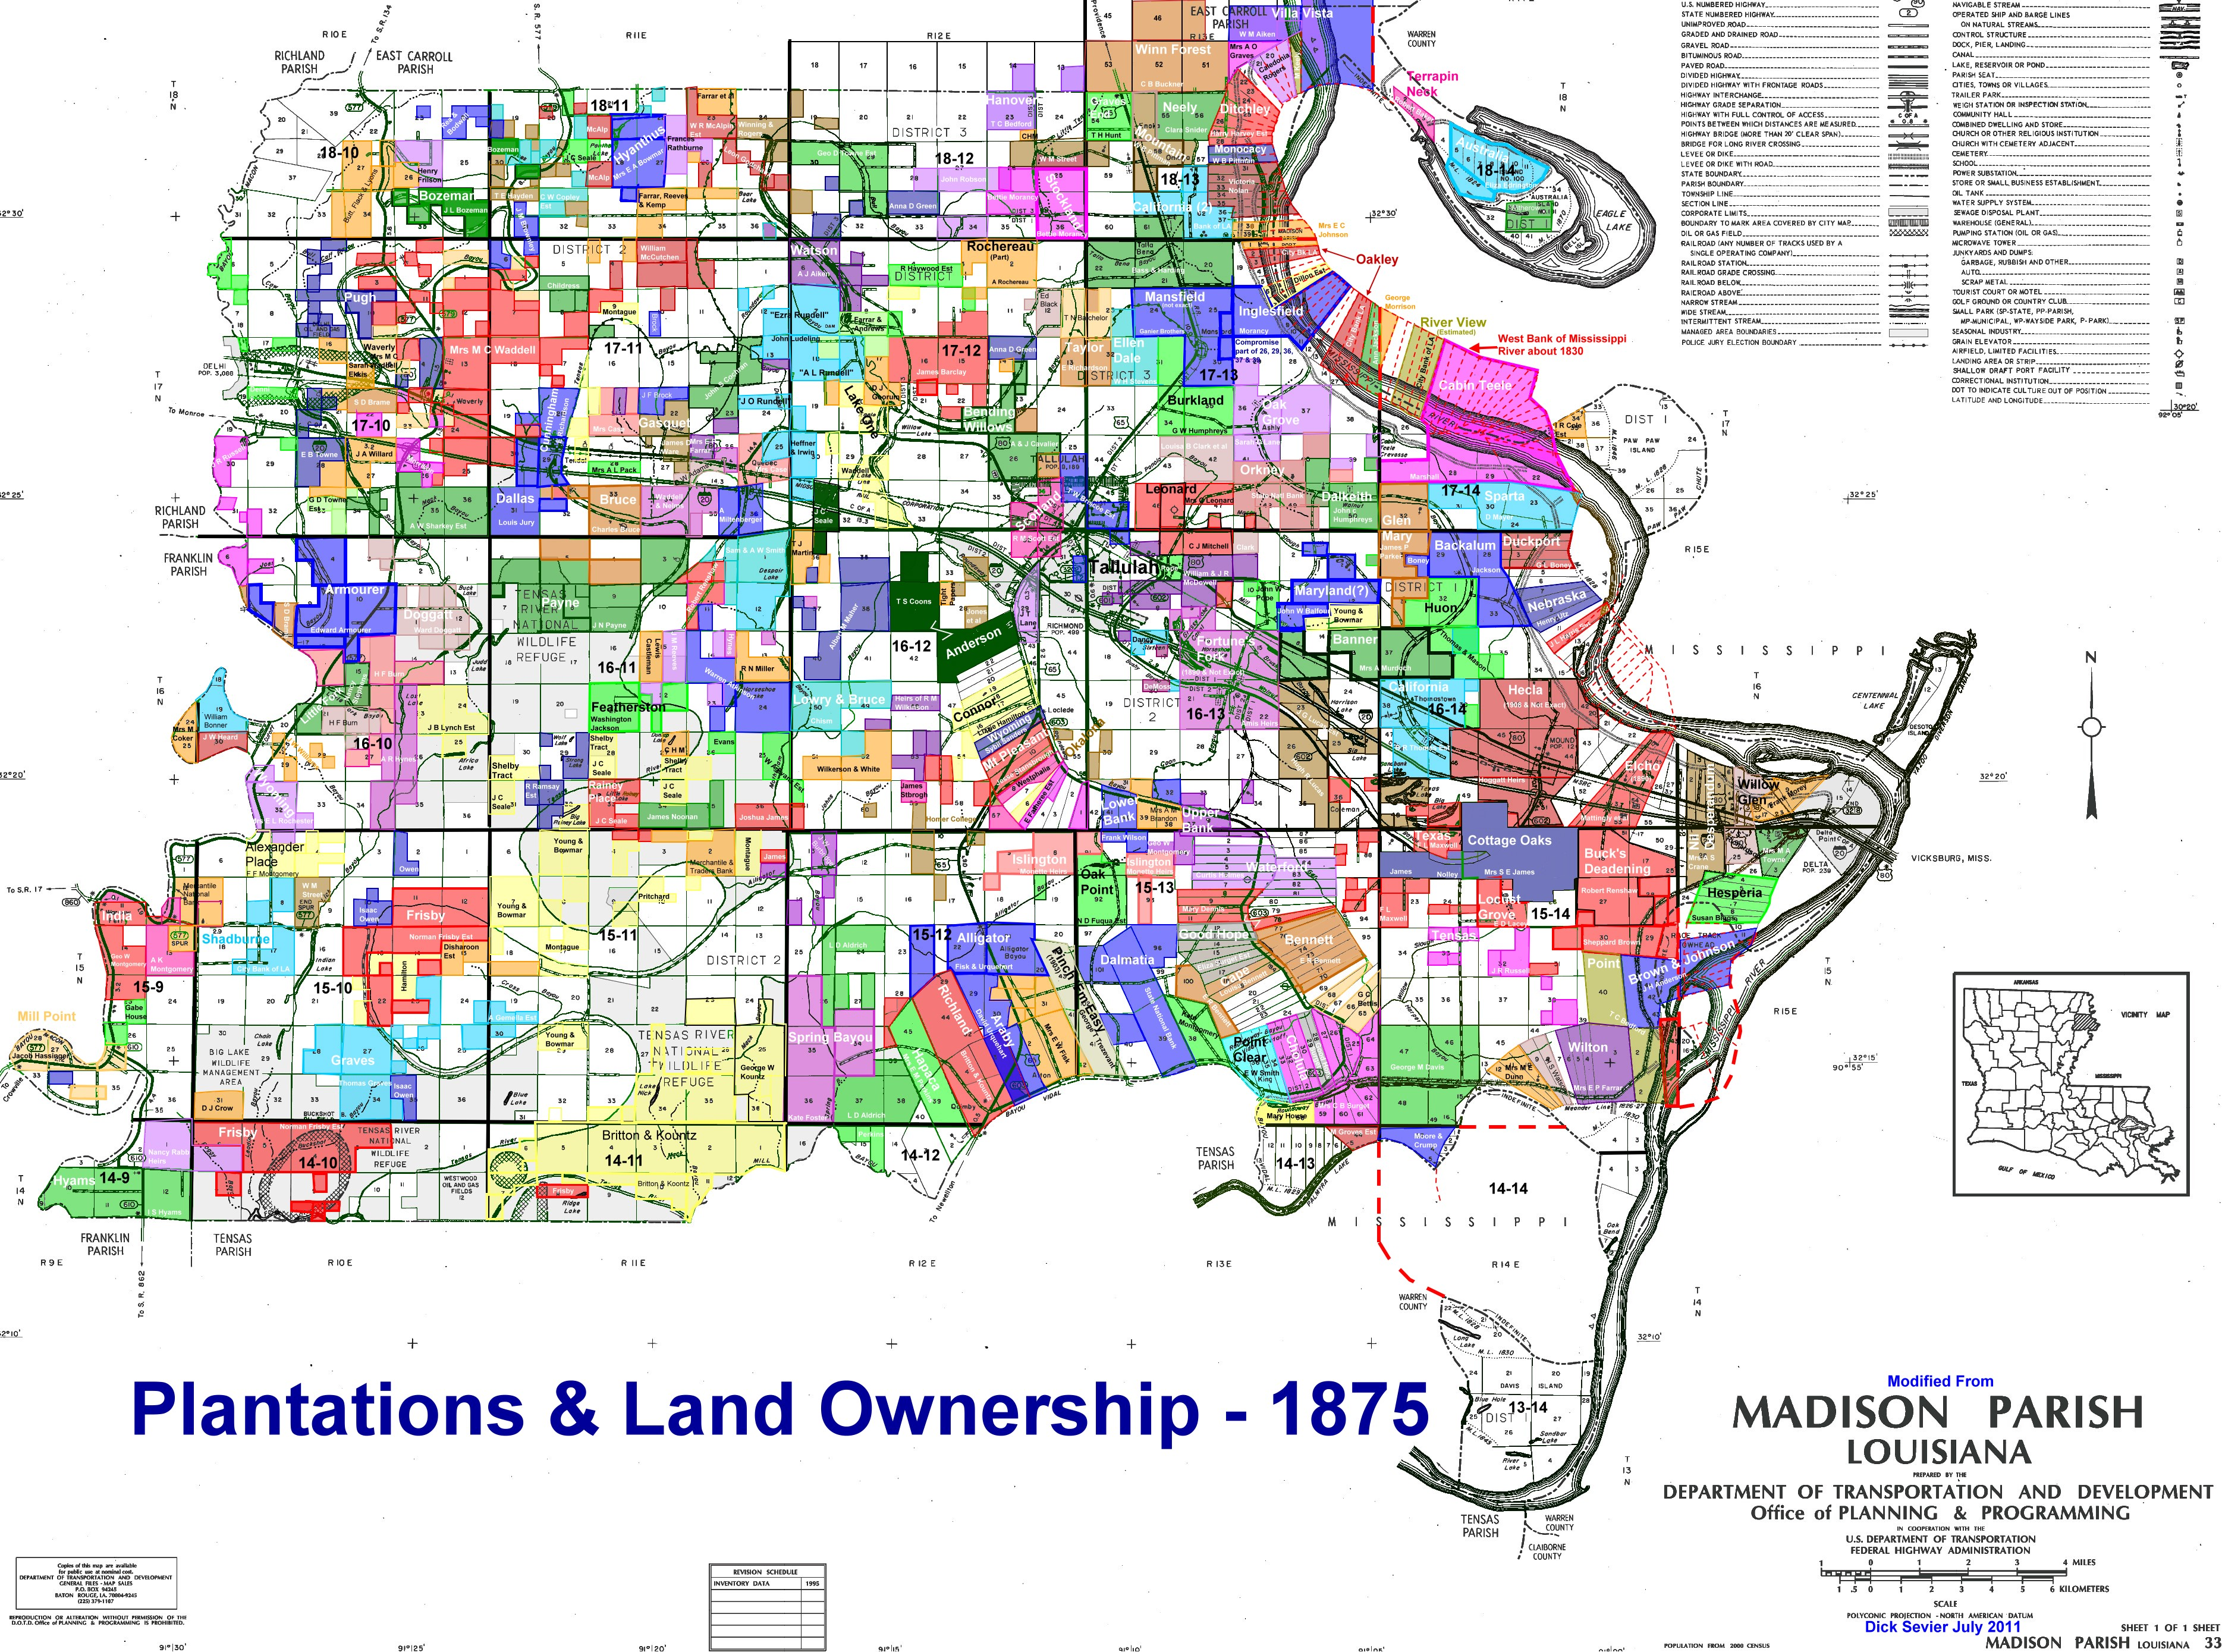 Map Of Louisiana Plantations.Madison Parish Plantation And Landowners 1875 1979